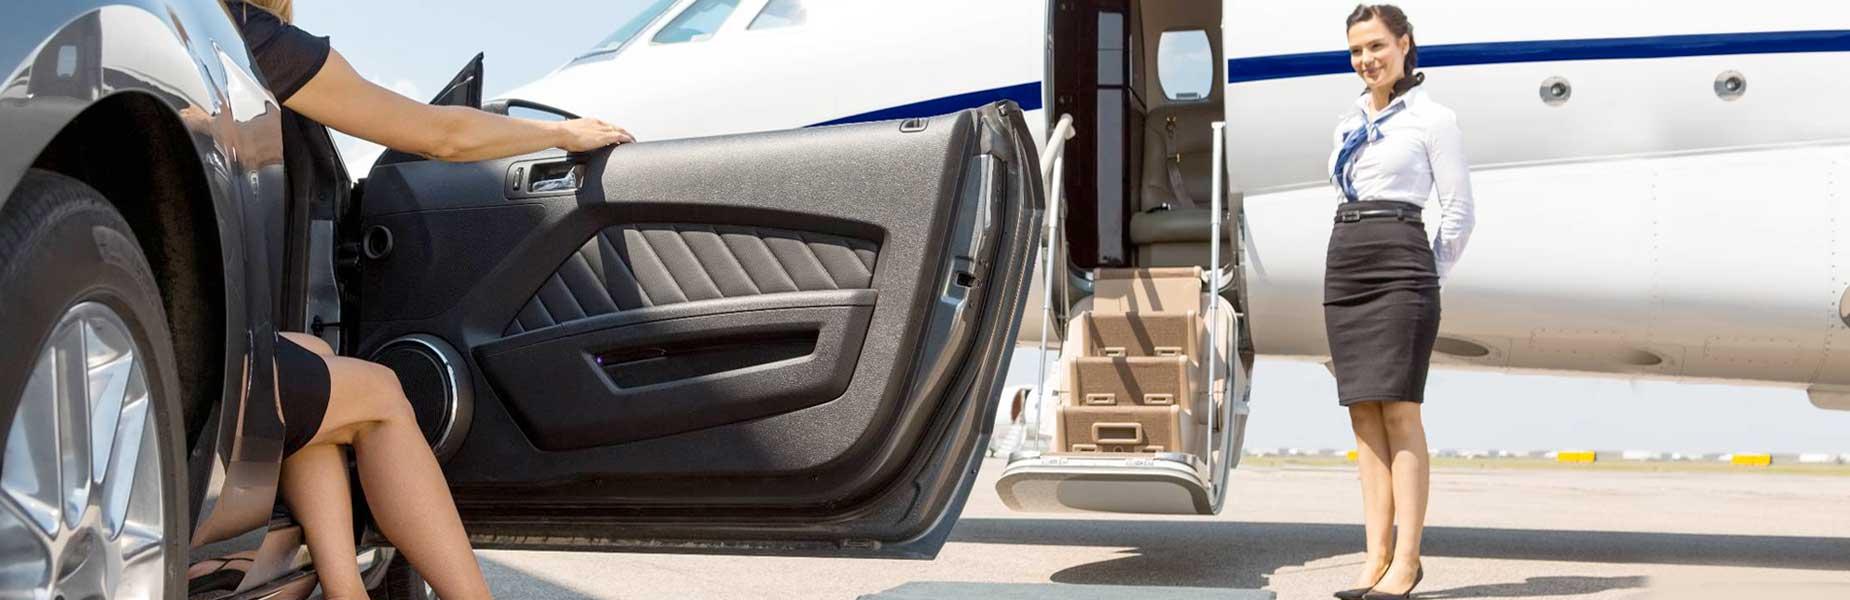 Corporate Black Car Transportation